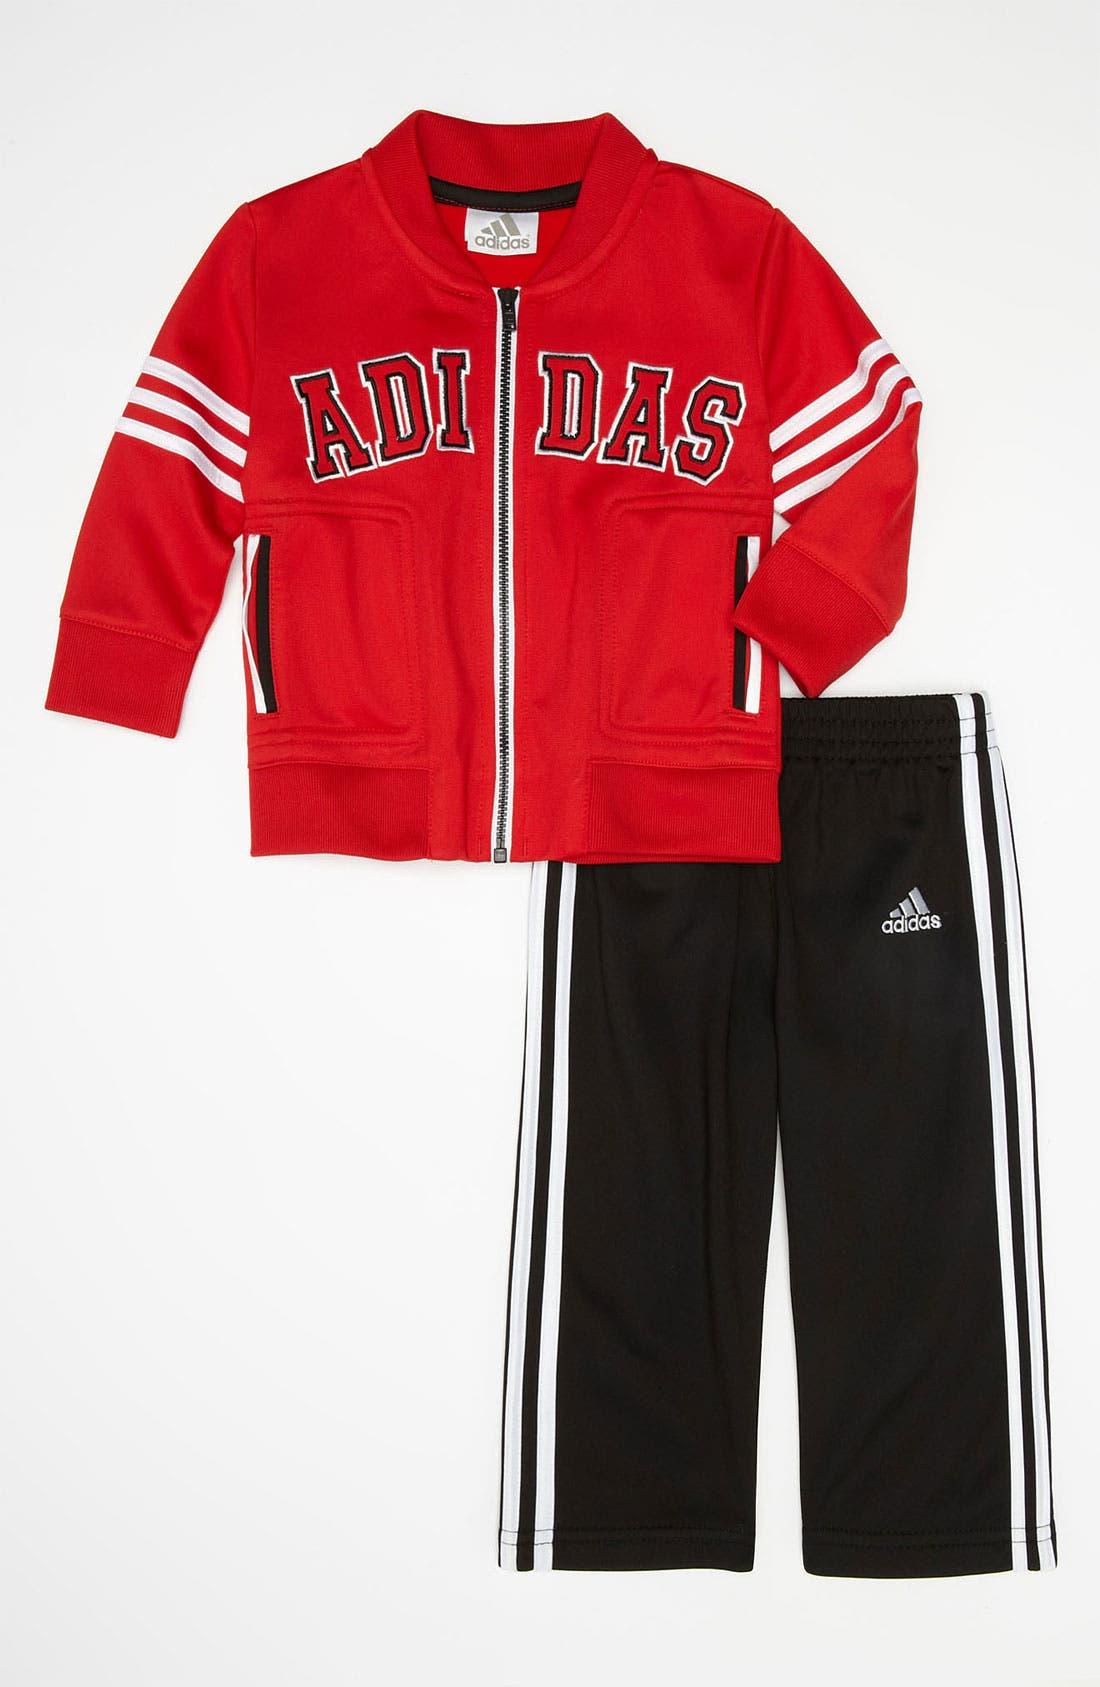 Main Image - adidas 'Team' Jacket & Pants (Toddler)